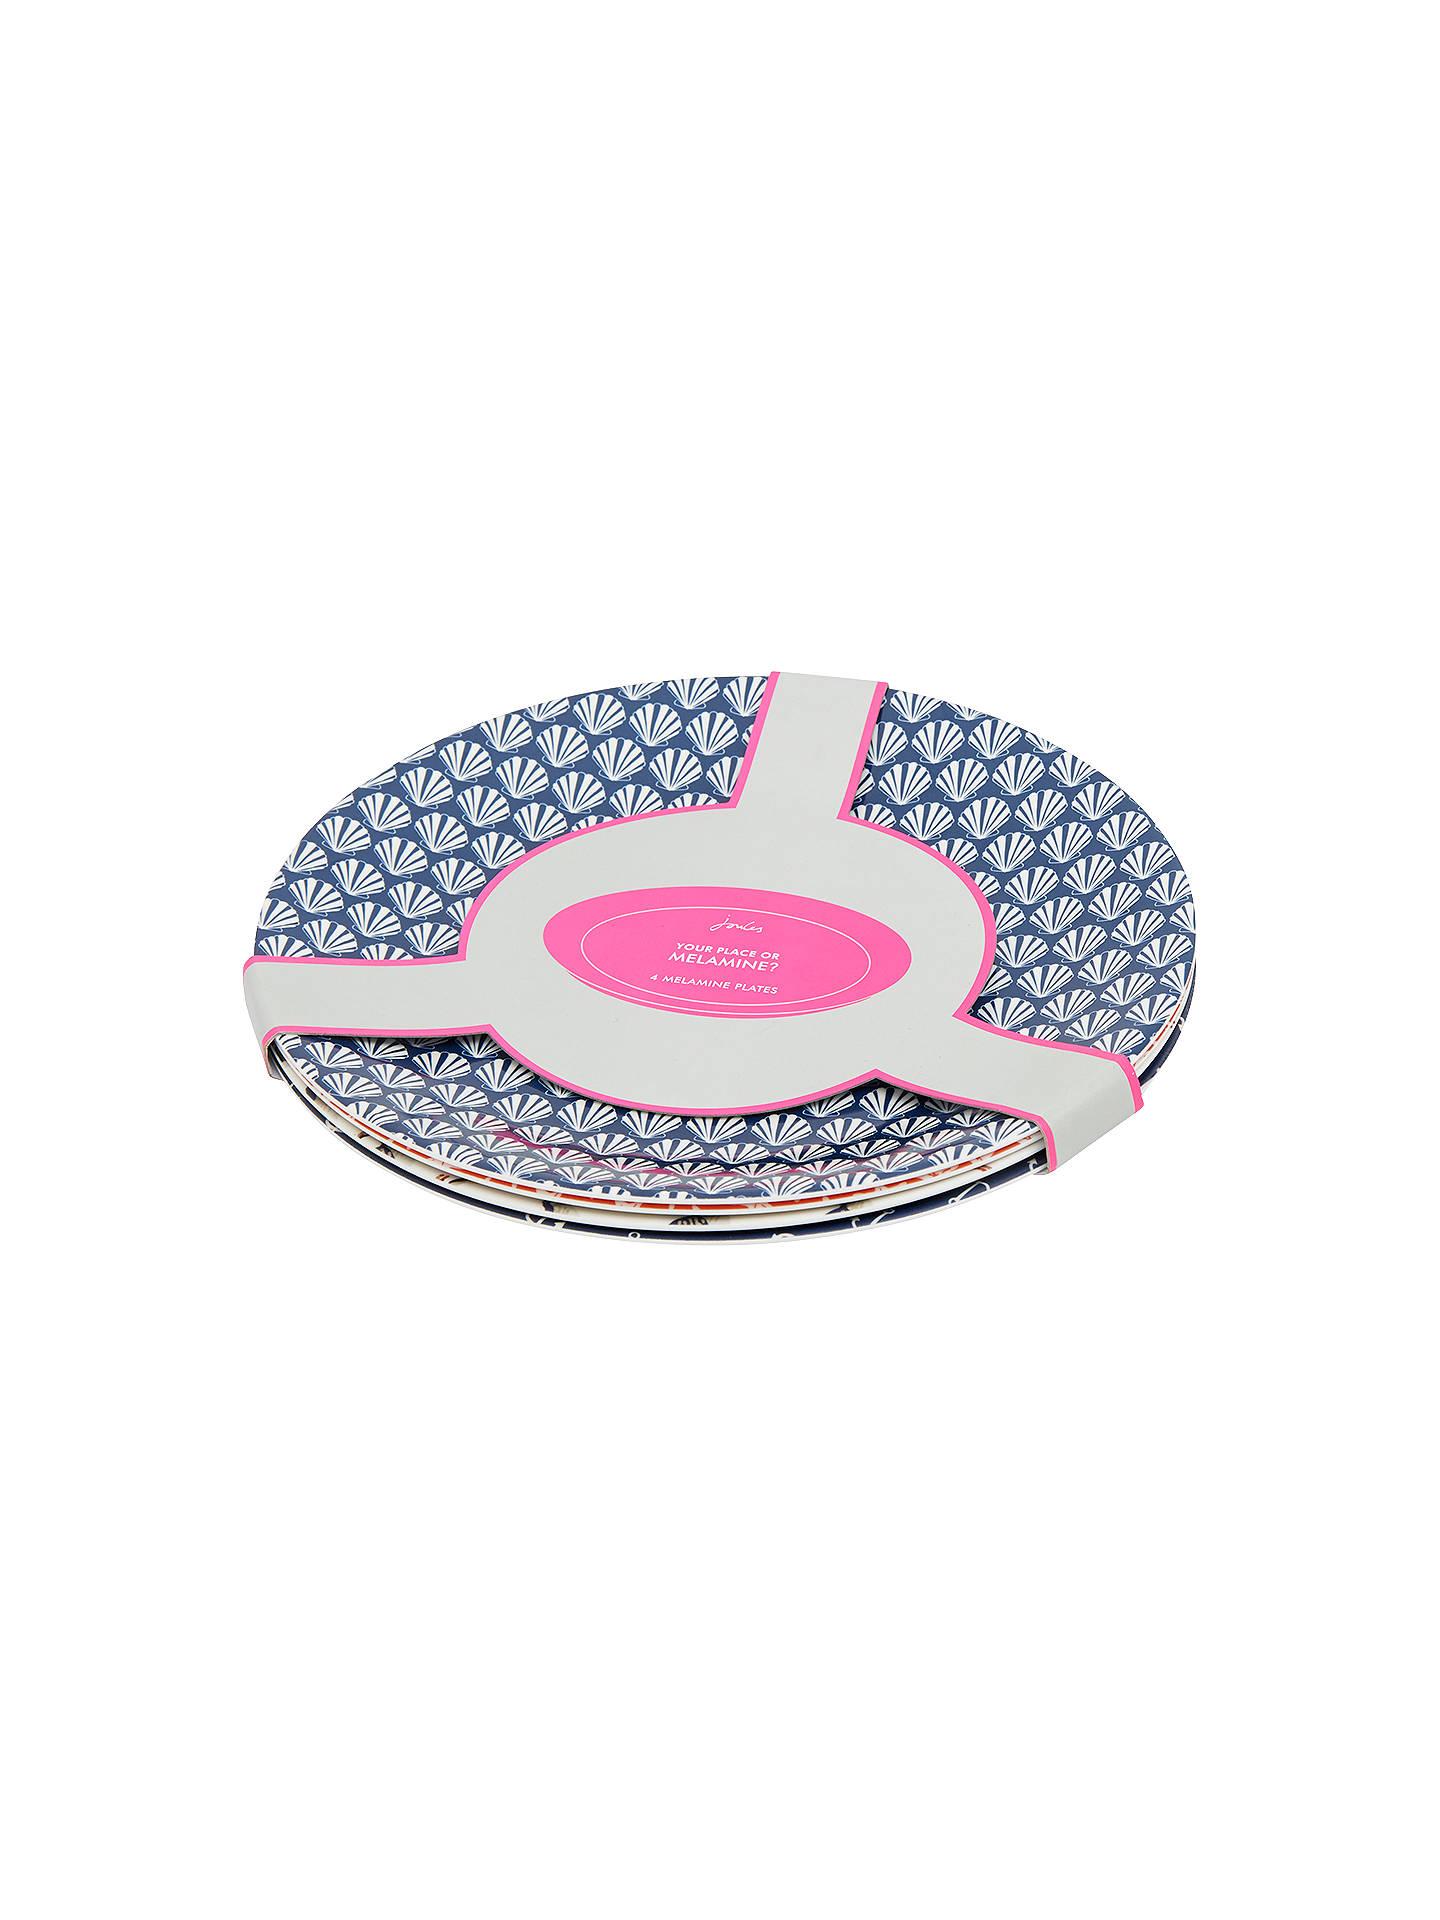 Buy joules melamine 25 8cm plates set of 4 online at johnlewis com